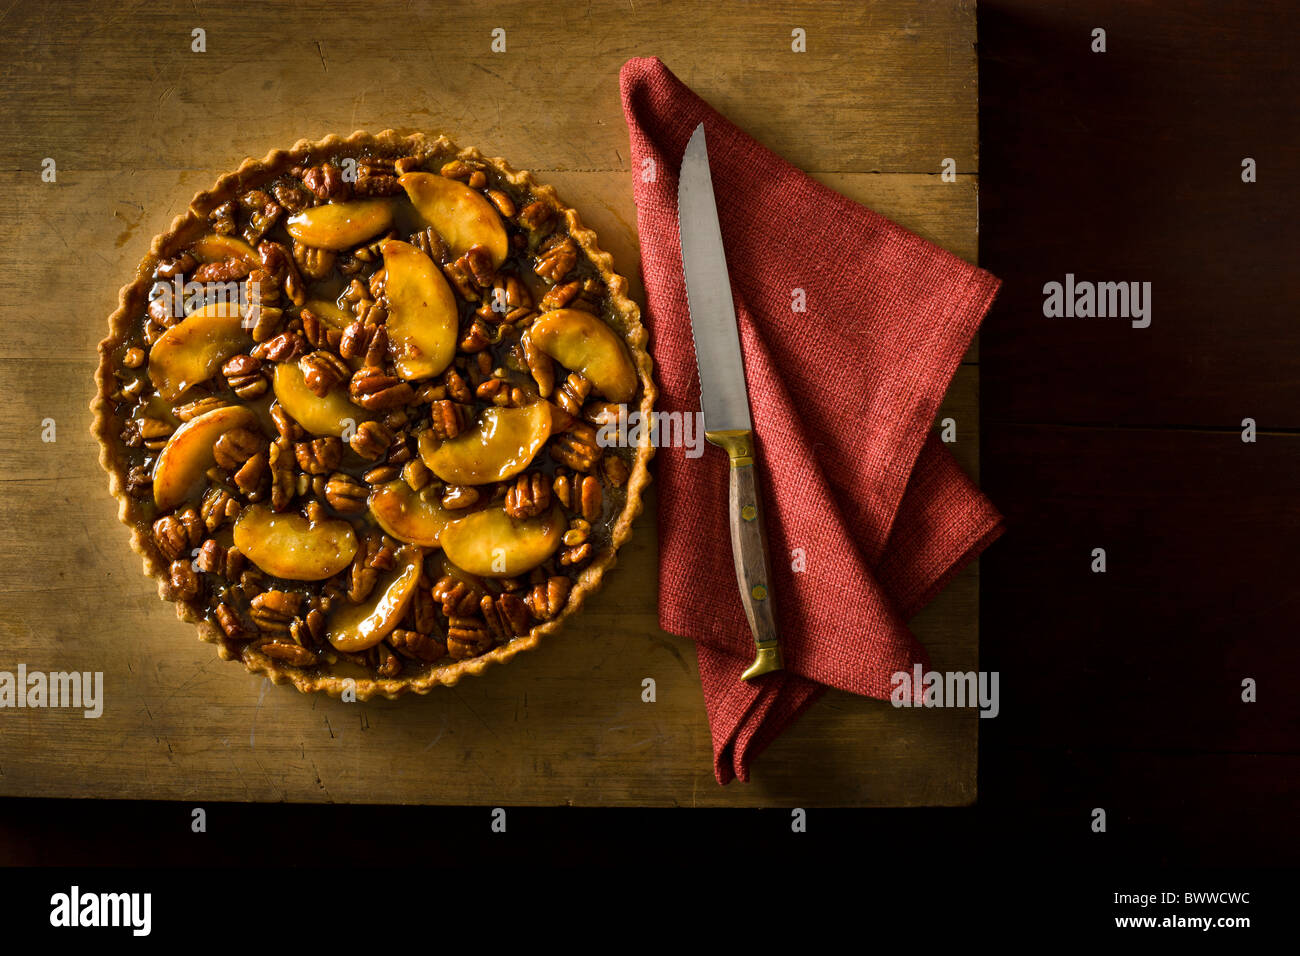 Nuez Tarta de manzana Imagen De Stock